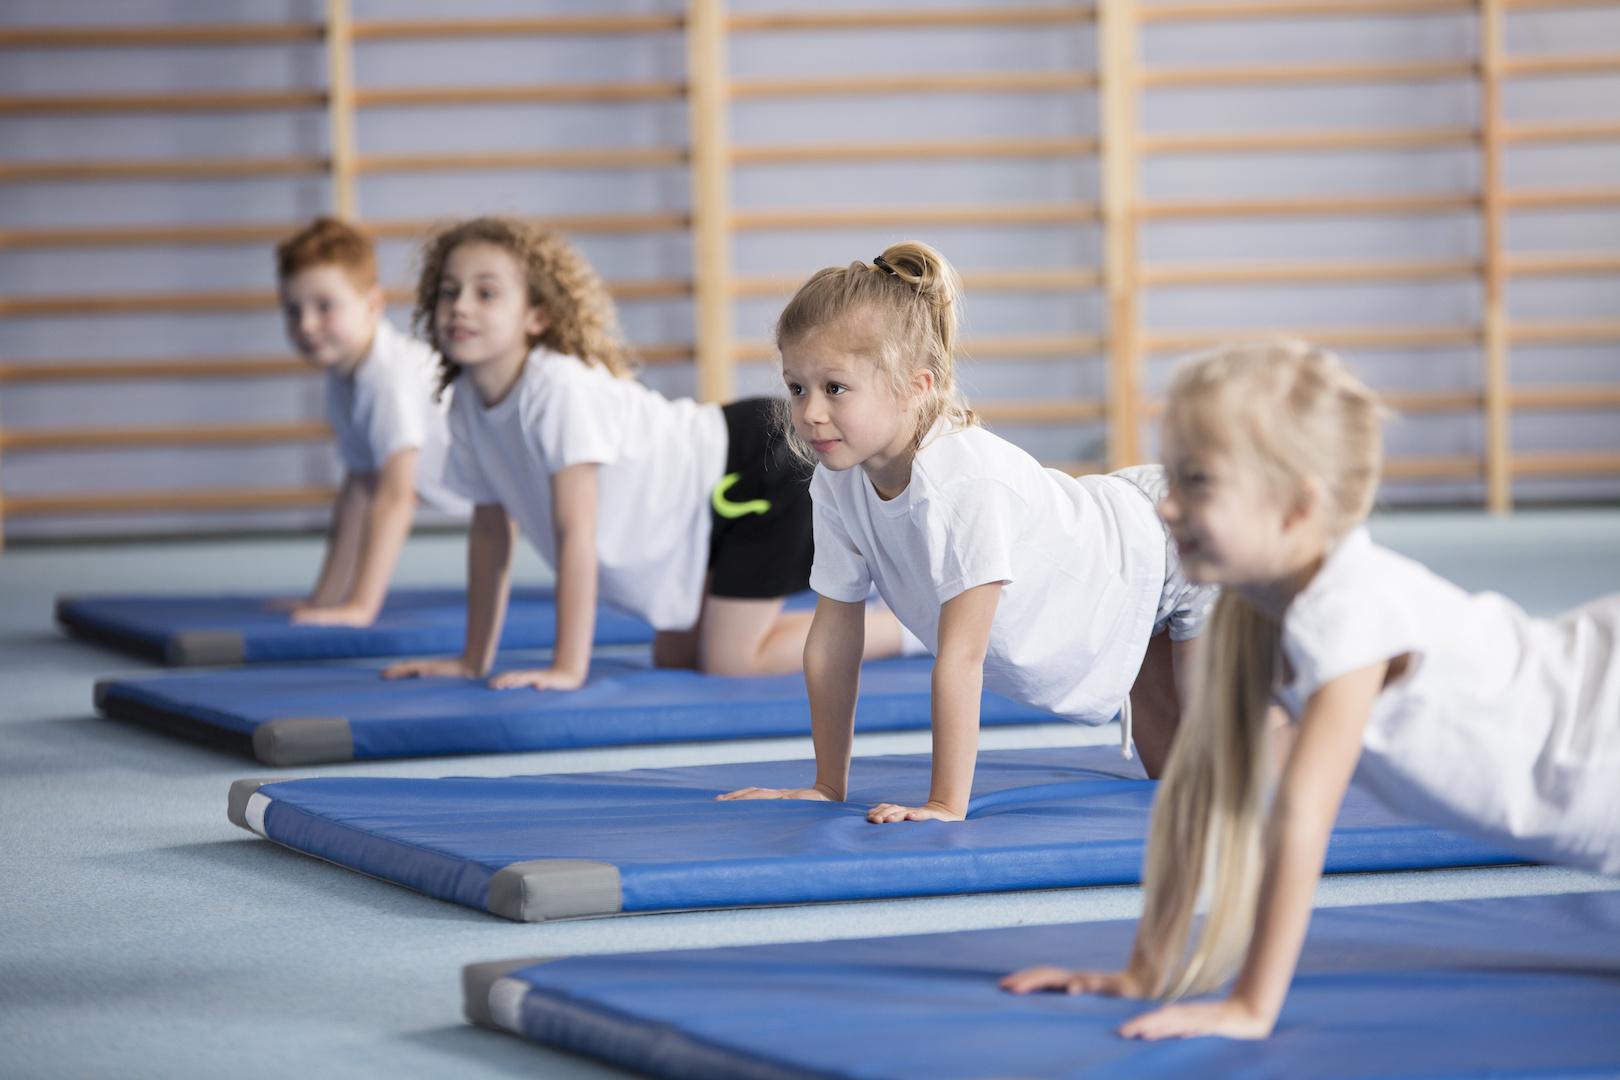 Gymnastics school holiday program 2 copy.jpg